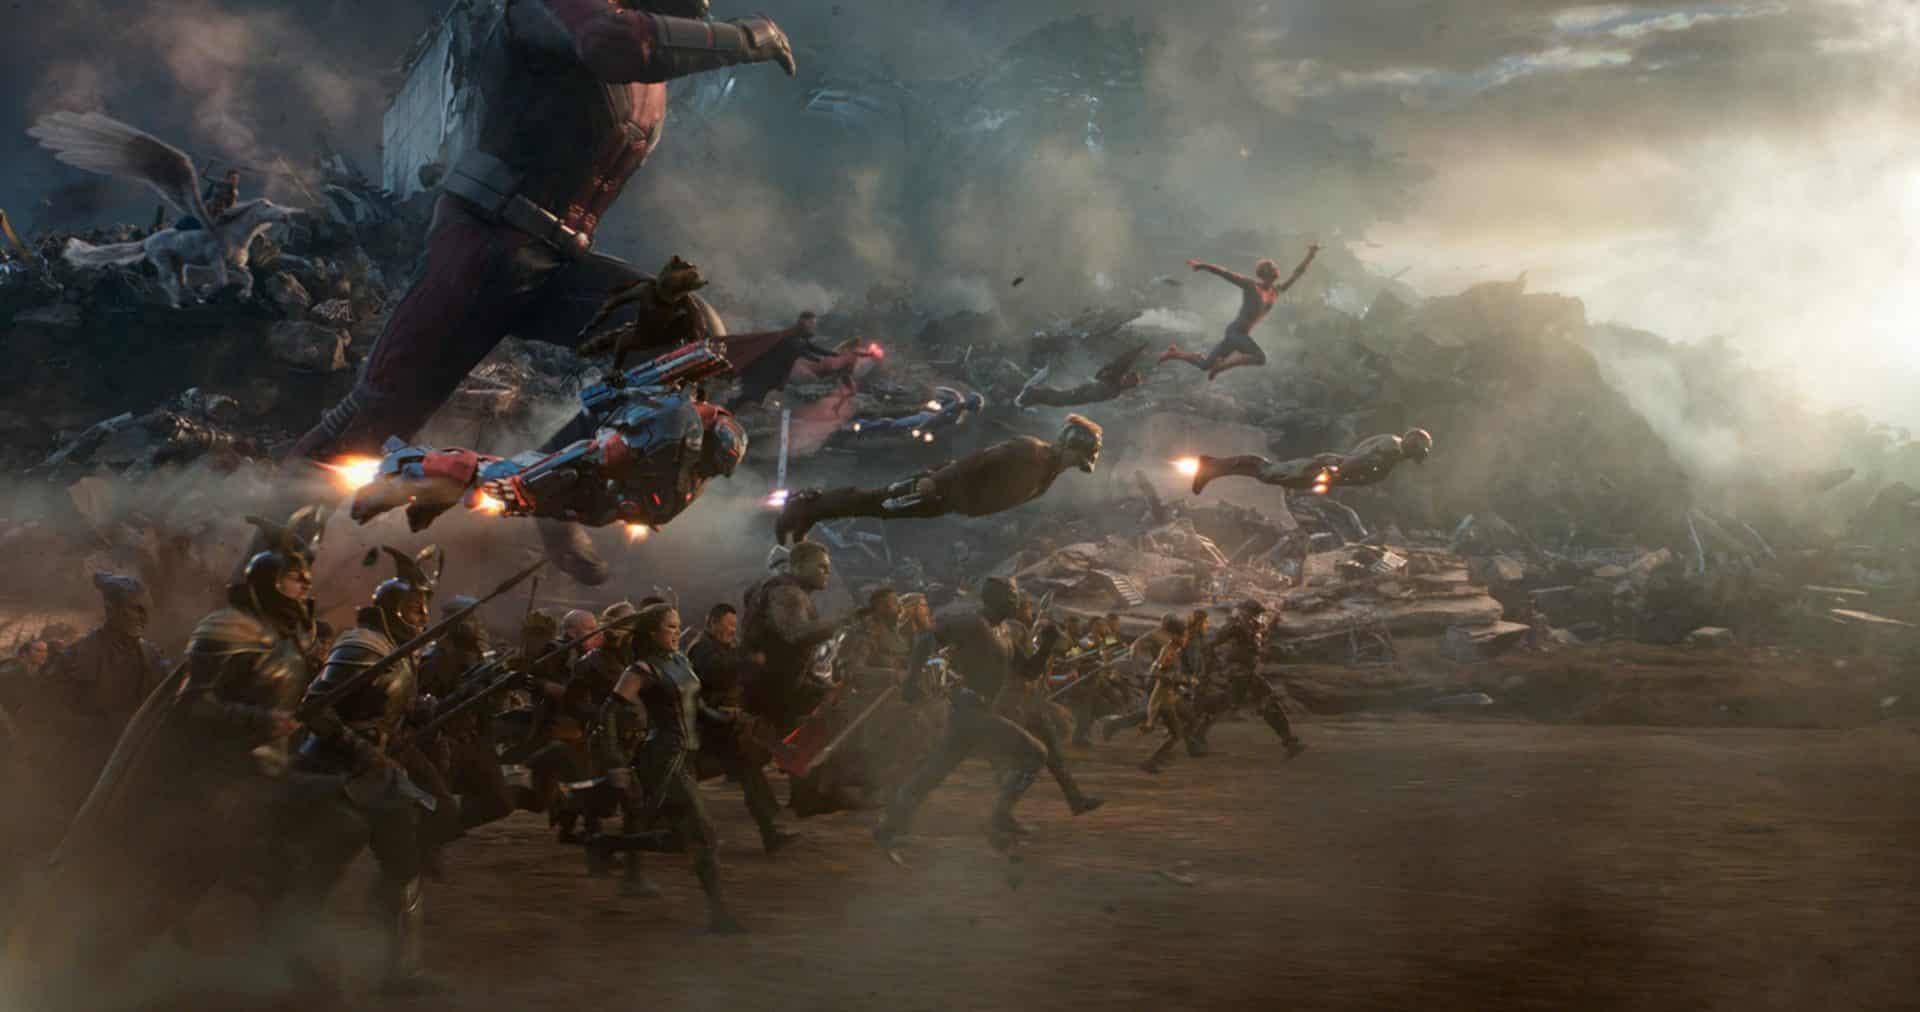 koniec avengers: endgame final fight bitka koniec